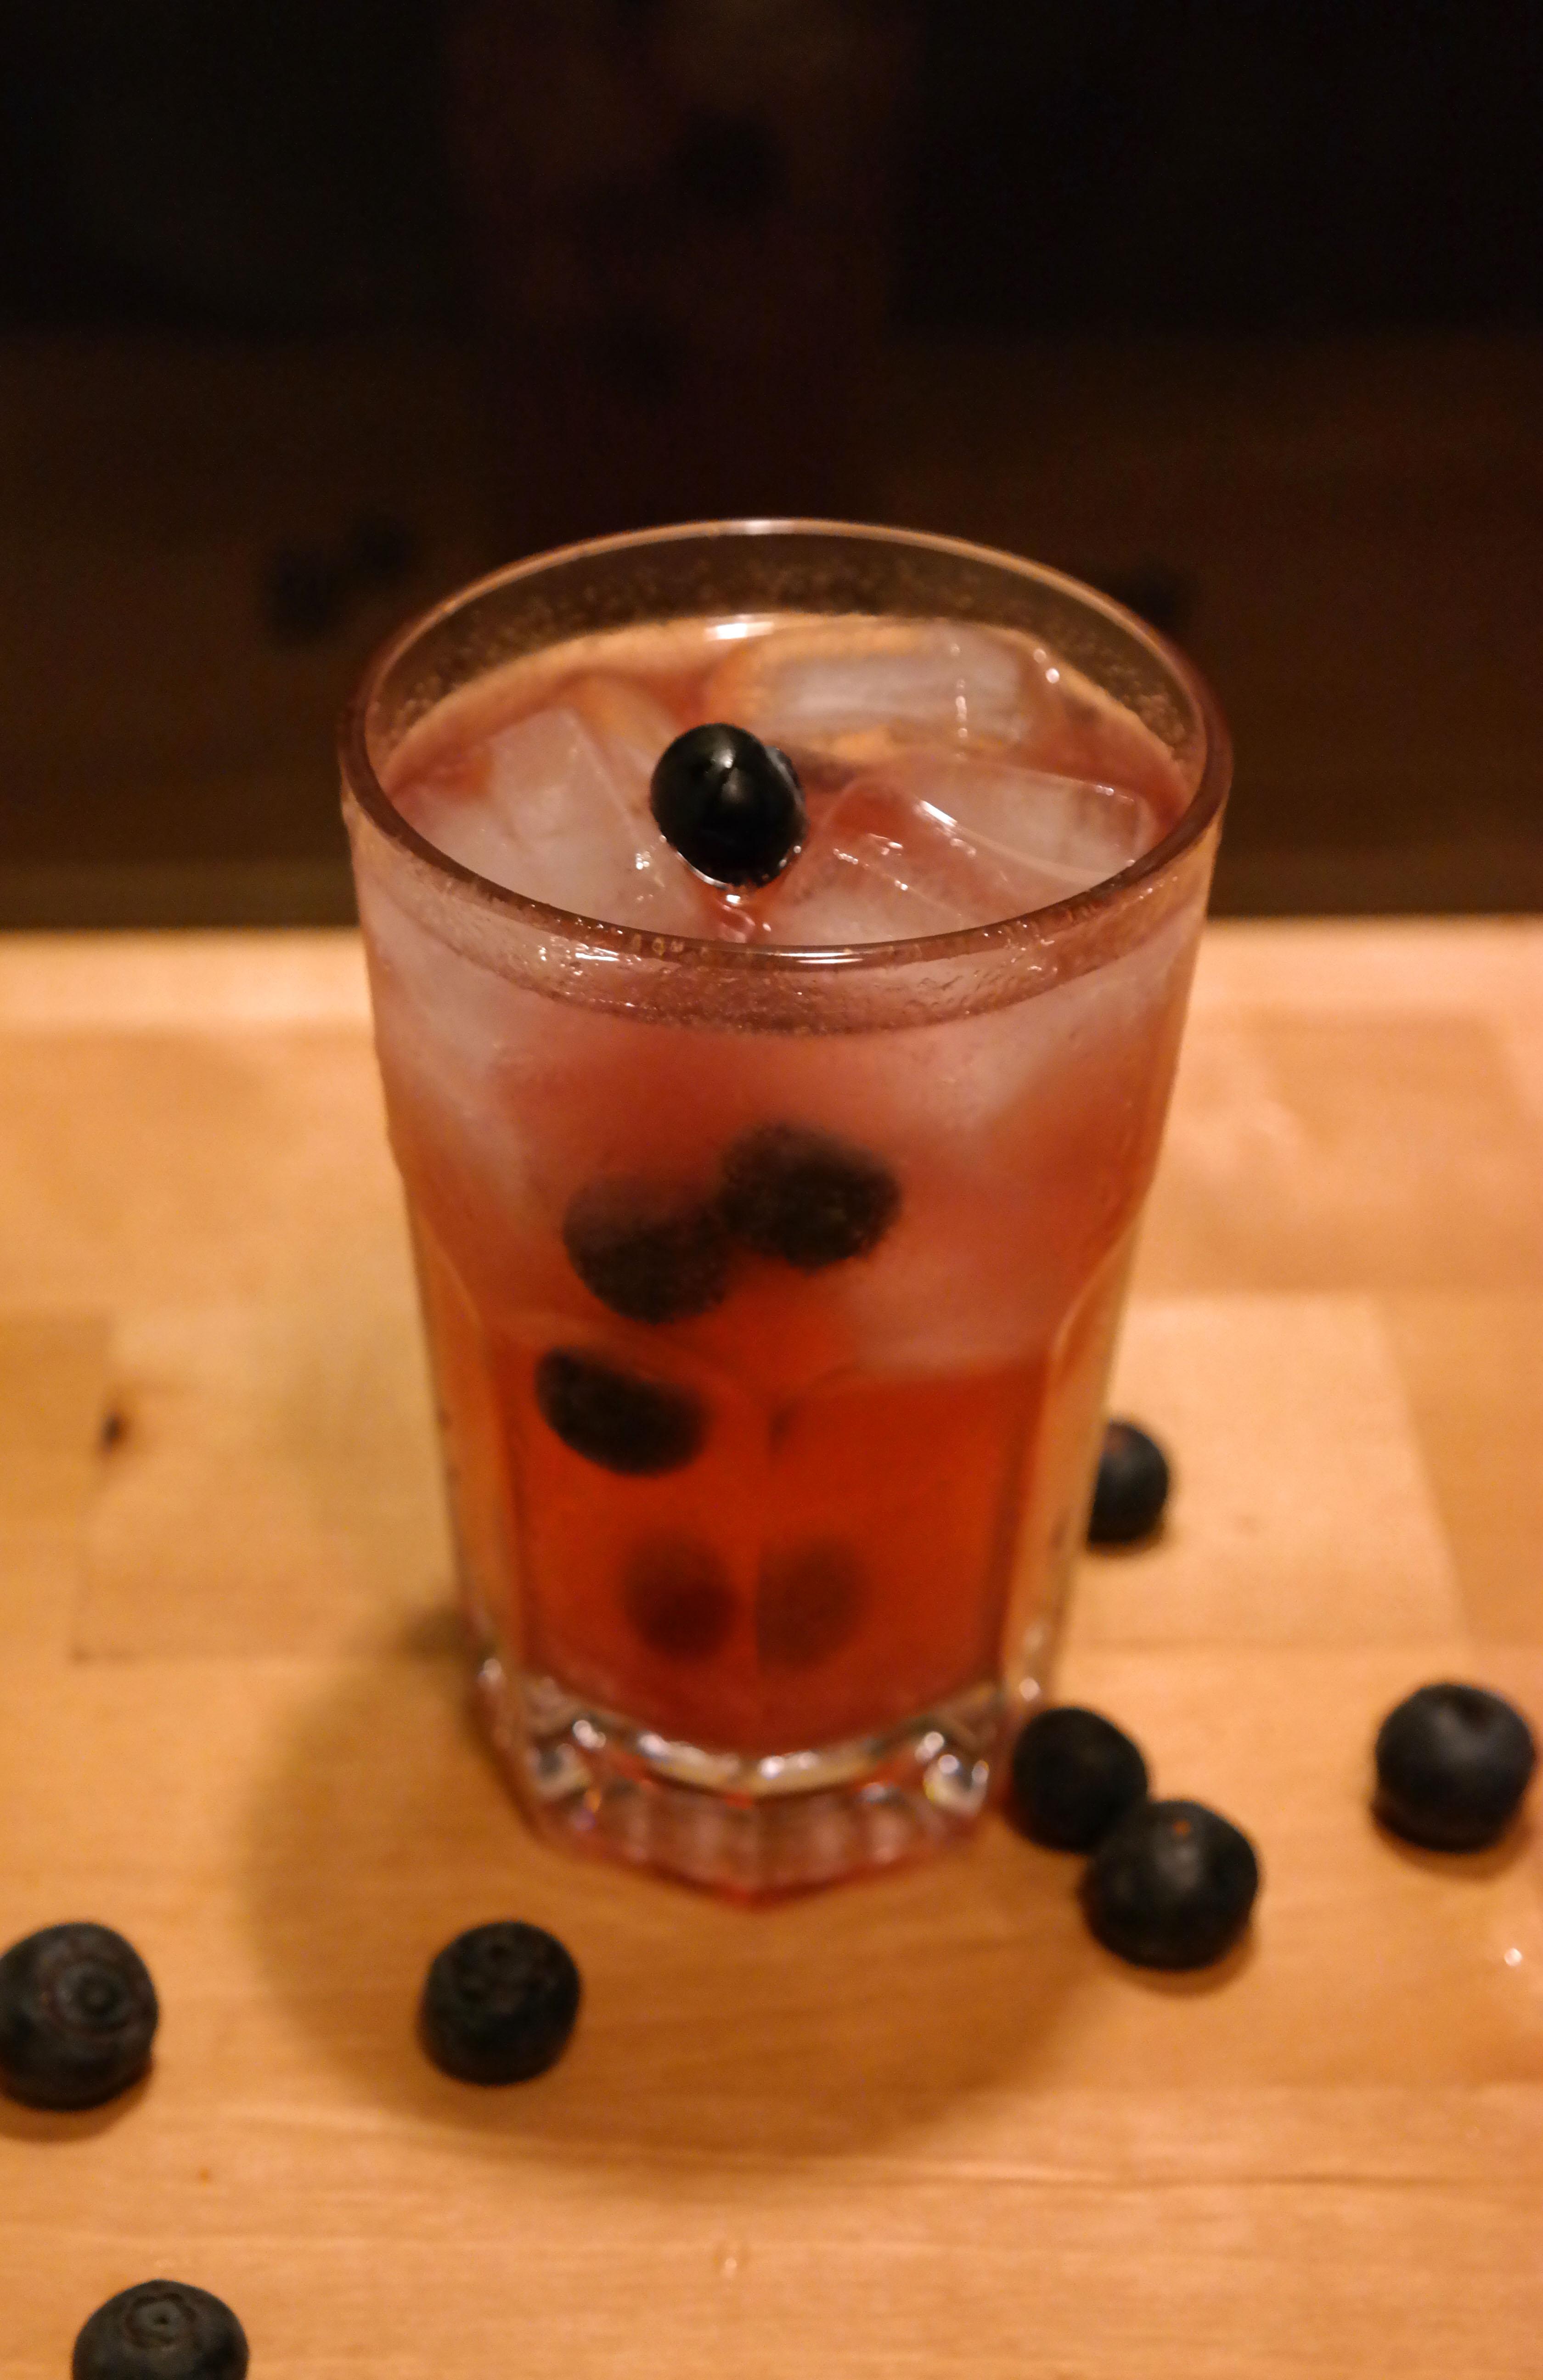 Blaubeer Gin and Tonic Heidelbeer G&T Gin & Tonic Rezept Vegan